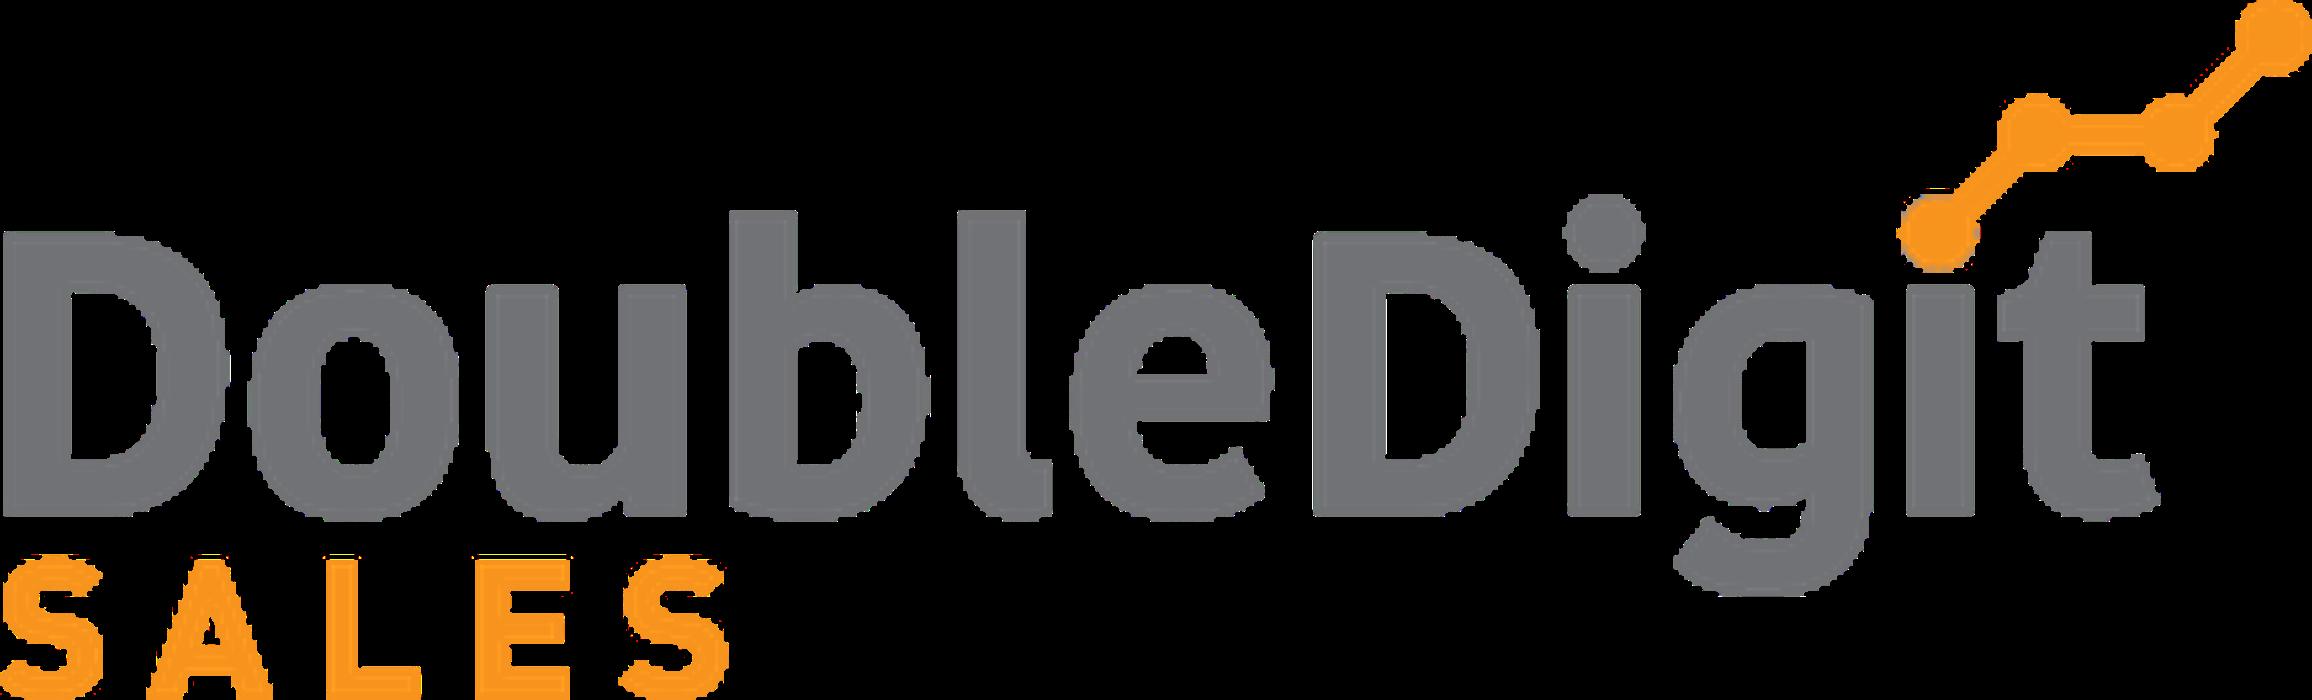 DoubleDigit Sales - New York, NY